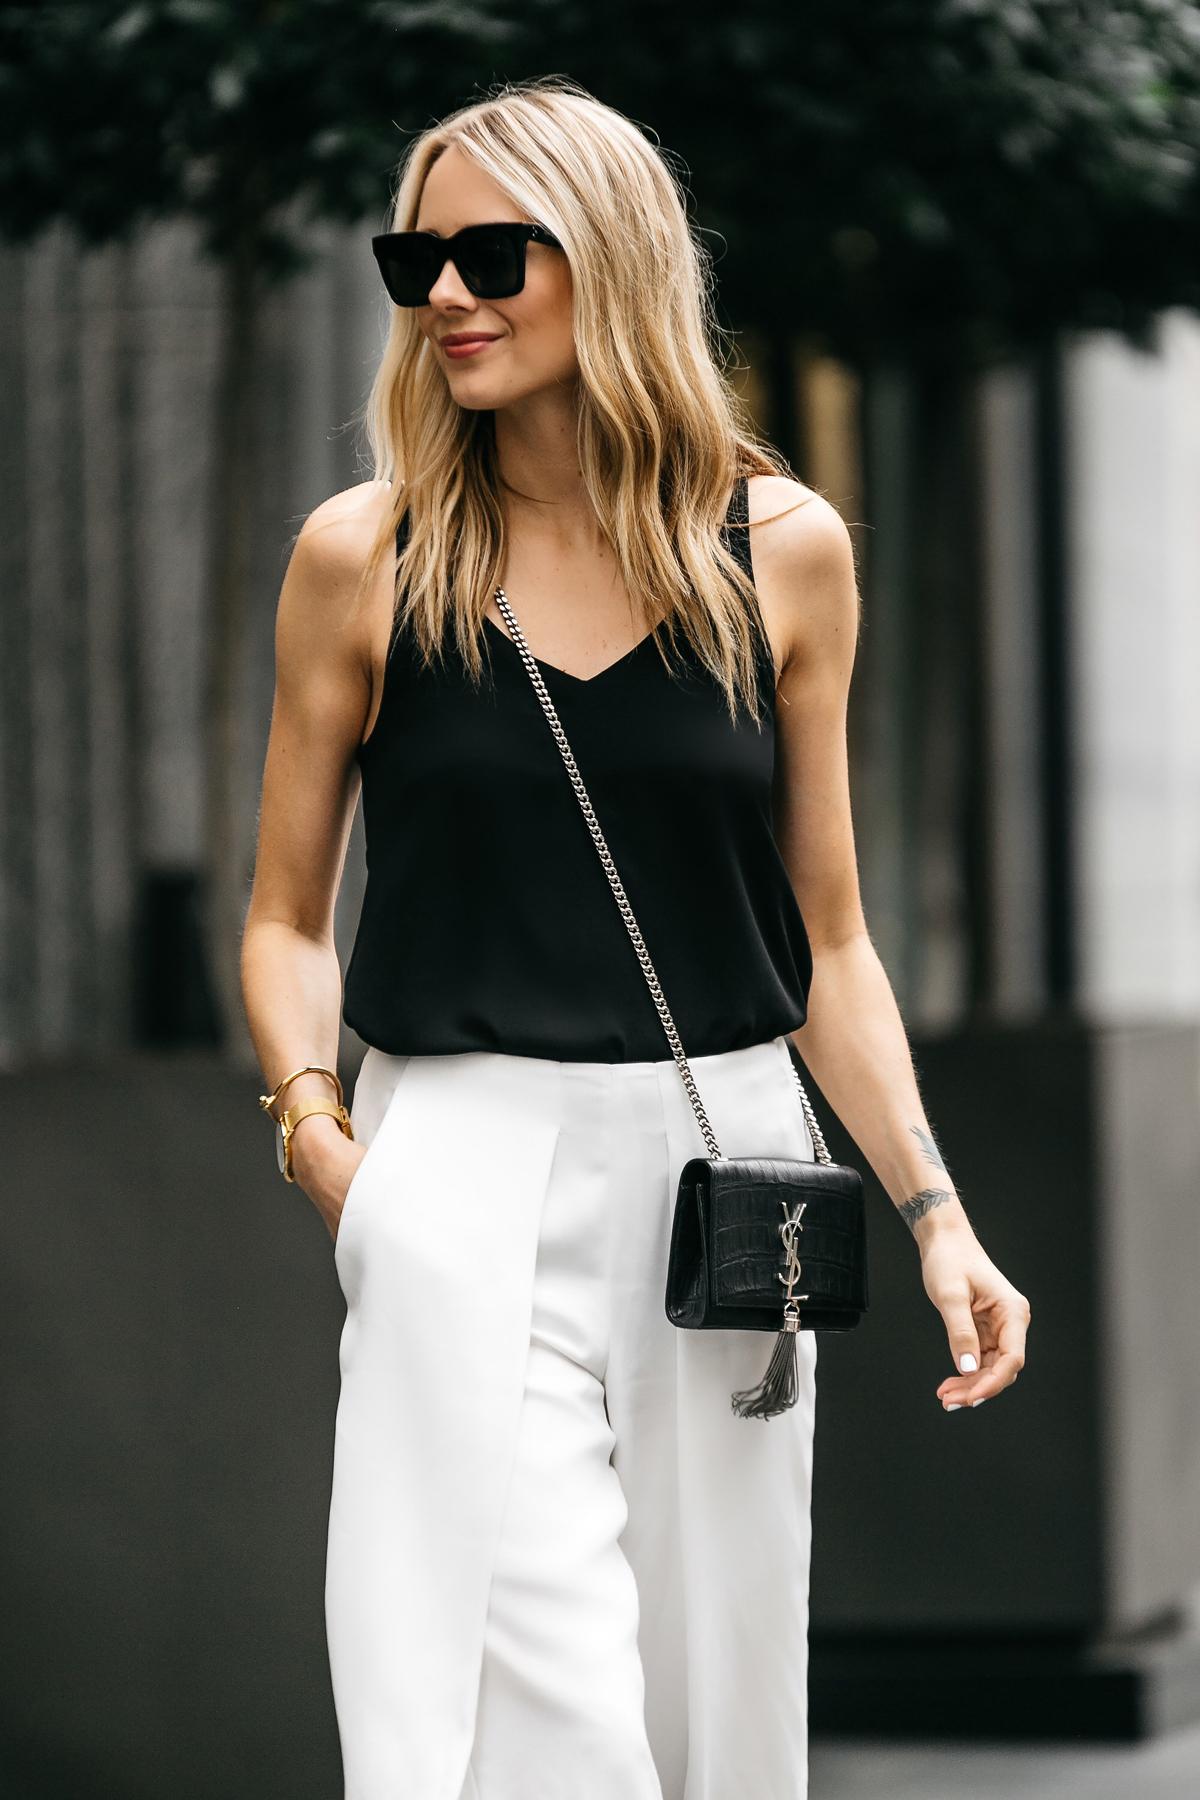 Fashion Jackson, Dallas Blogger, Fashion Blogger, Street Style, Topshop Black Cami Tanktop, White Culottes, Saint Laurent Monogram Cassandre Crossbody Handbag